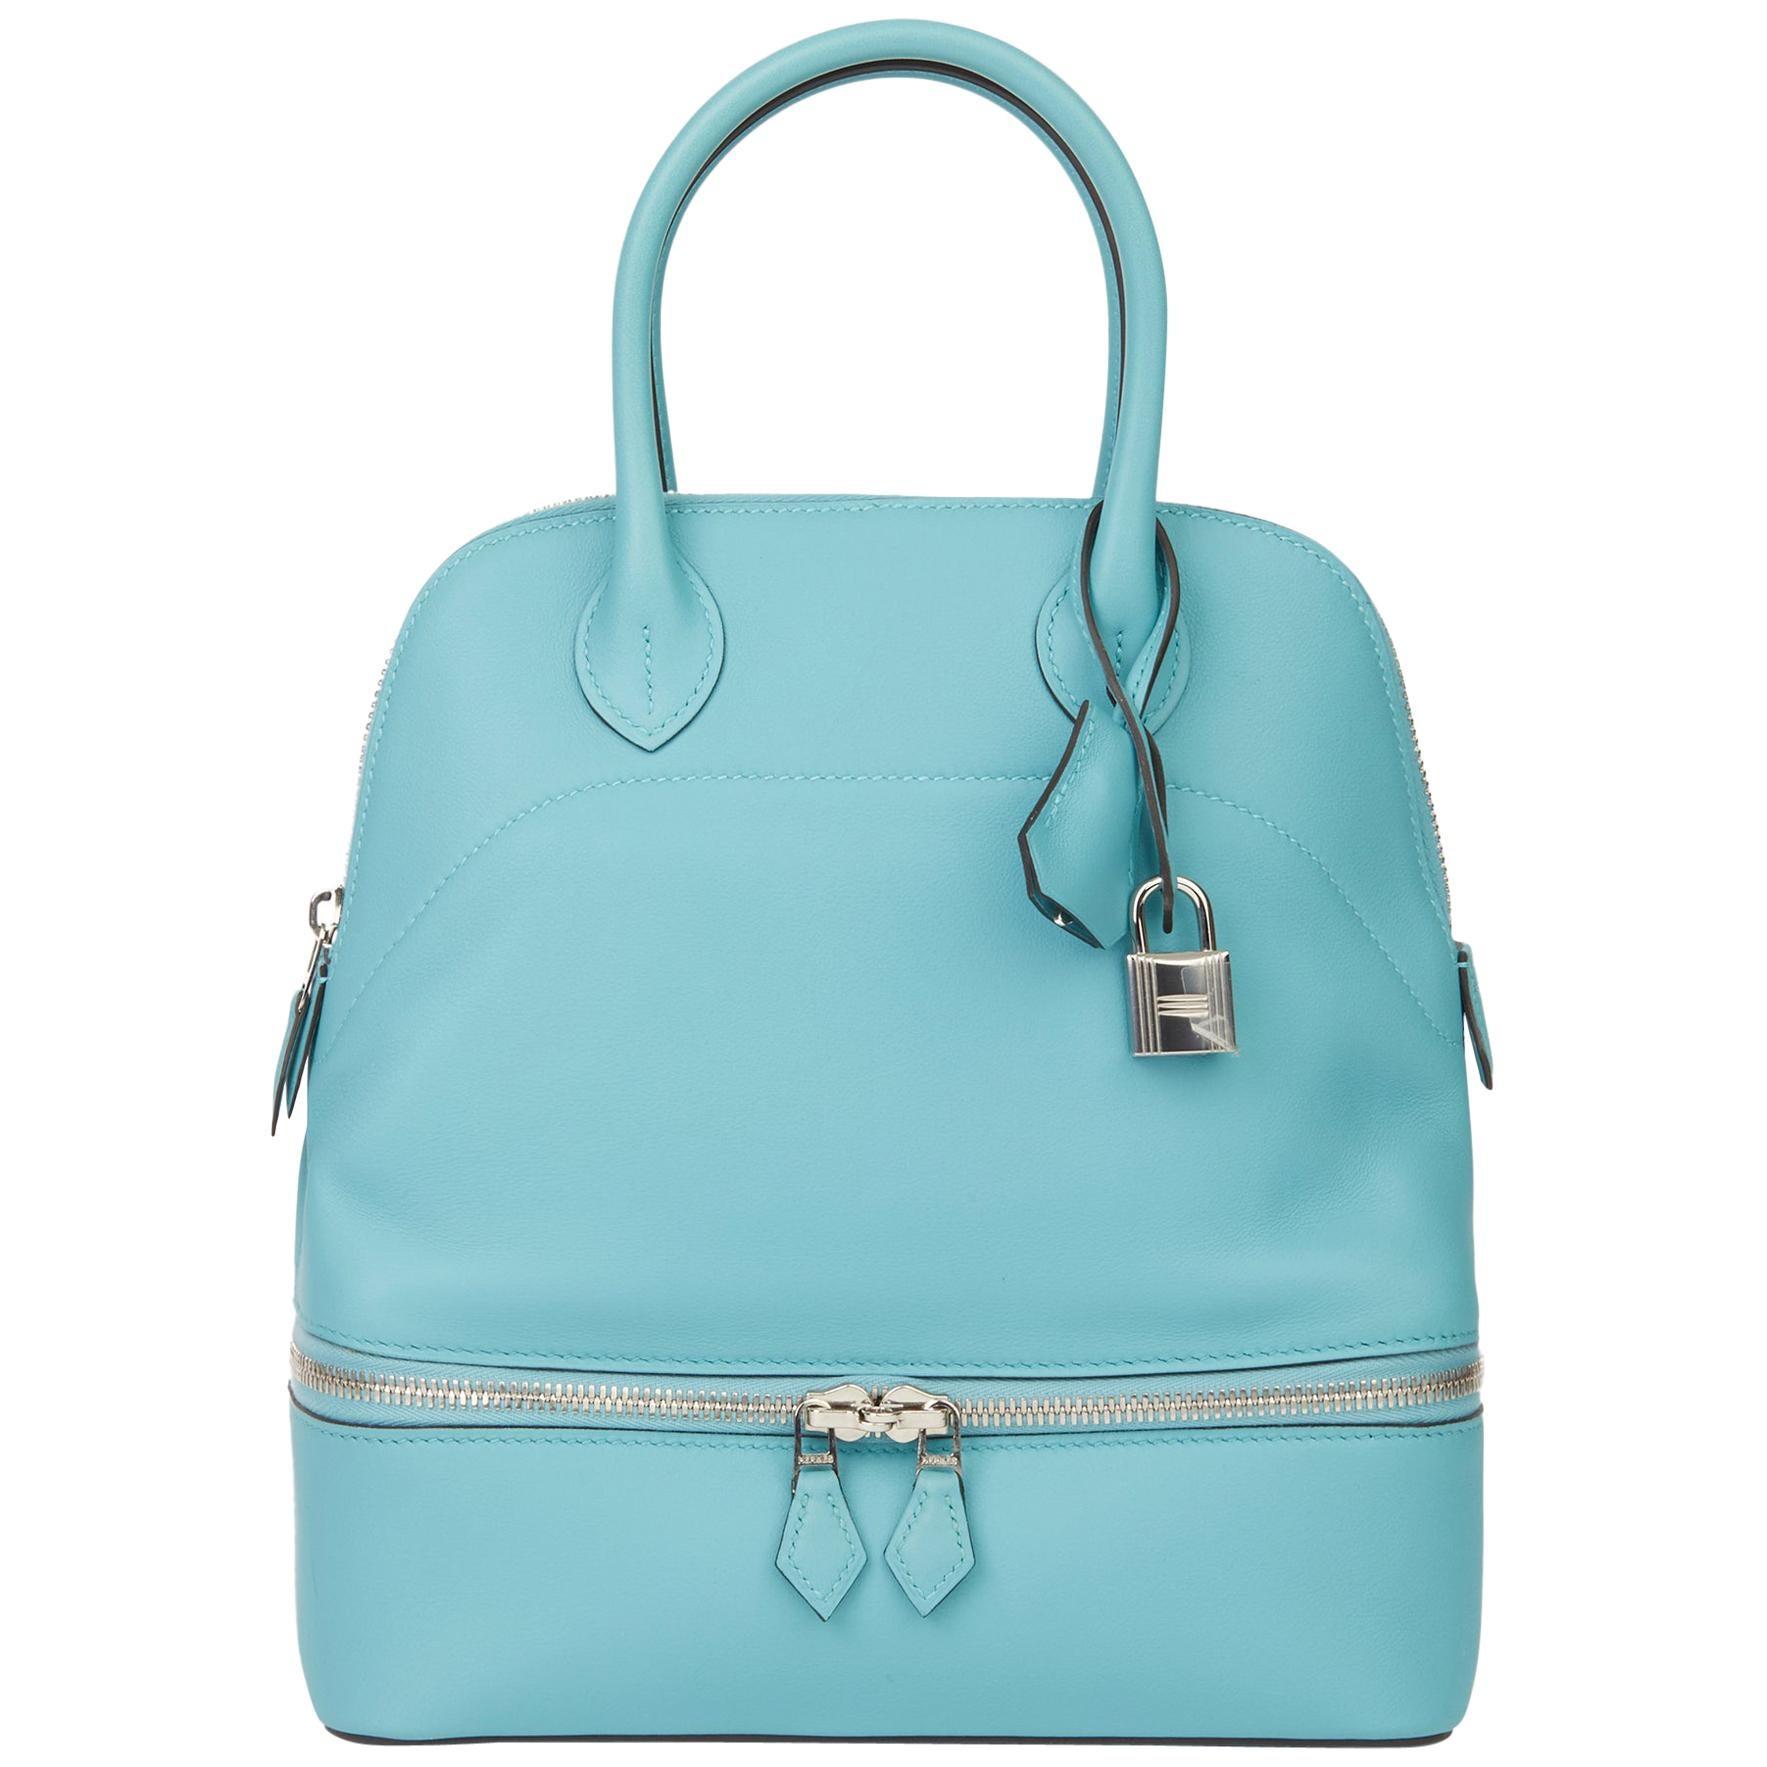 2016 Hermès Blue Atoll Swift Leather Bolide Secret